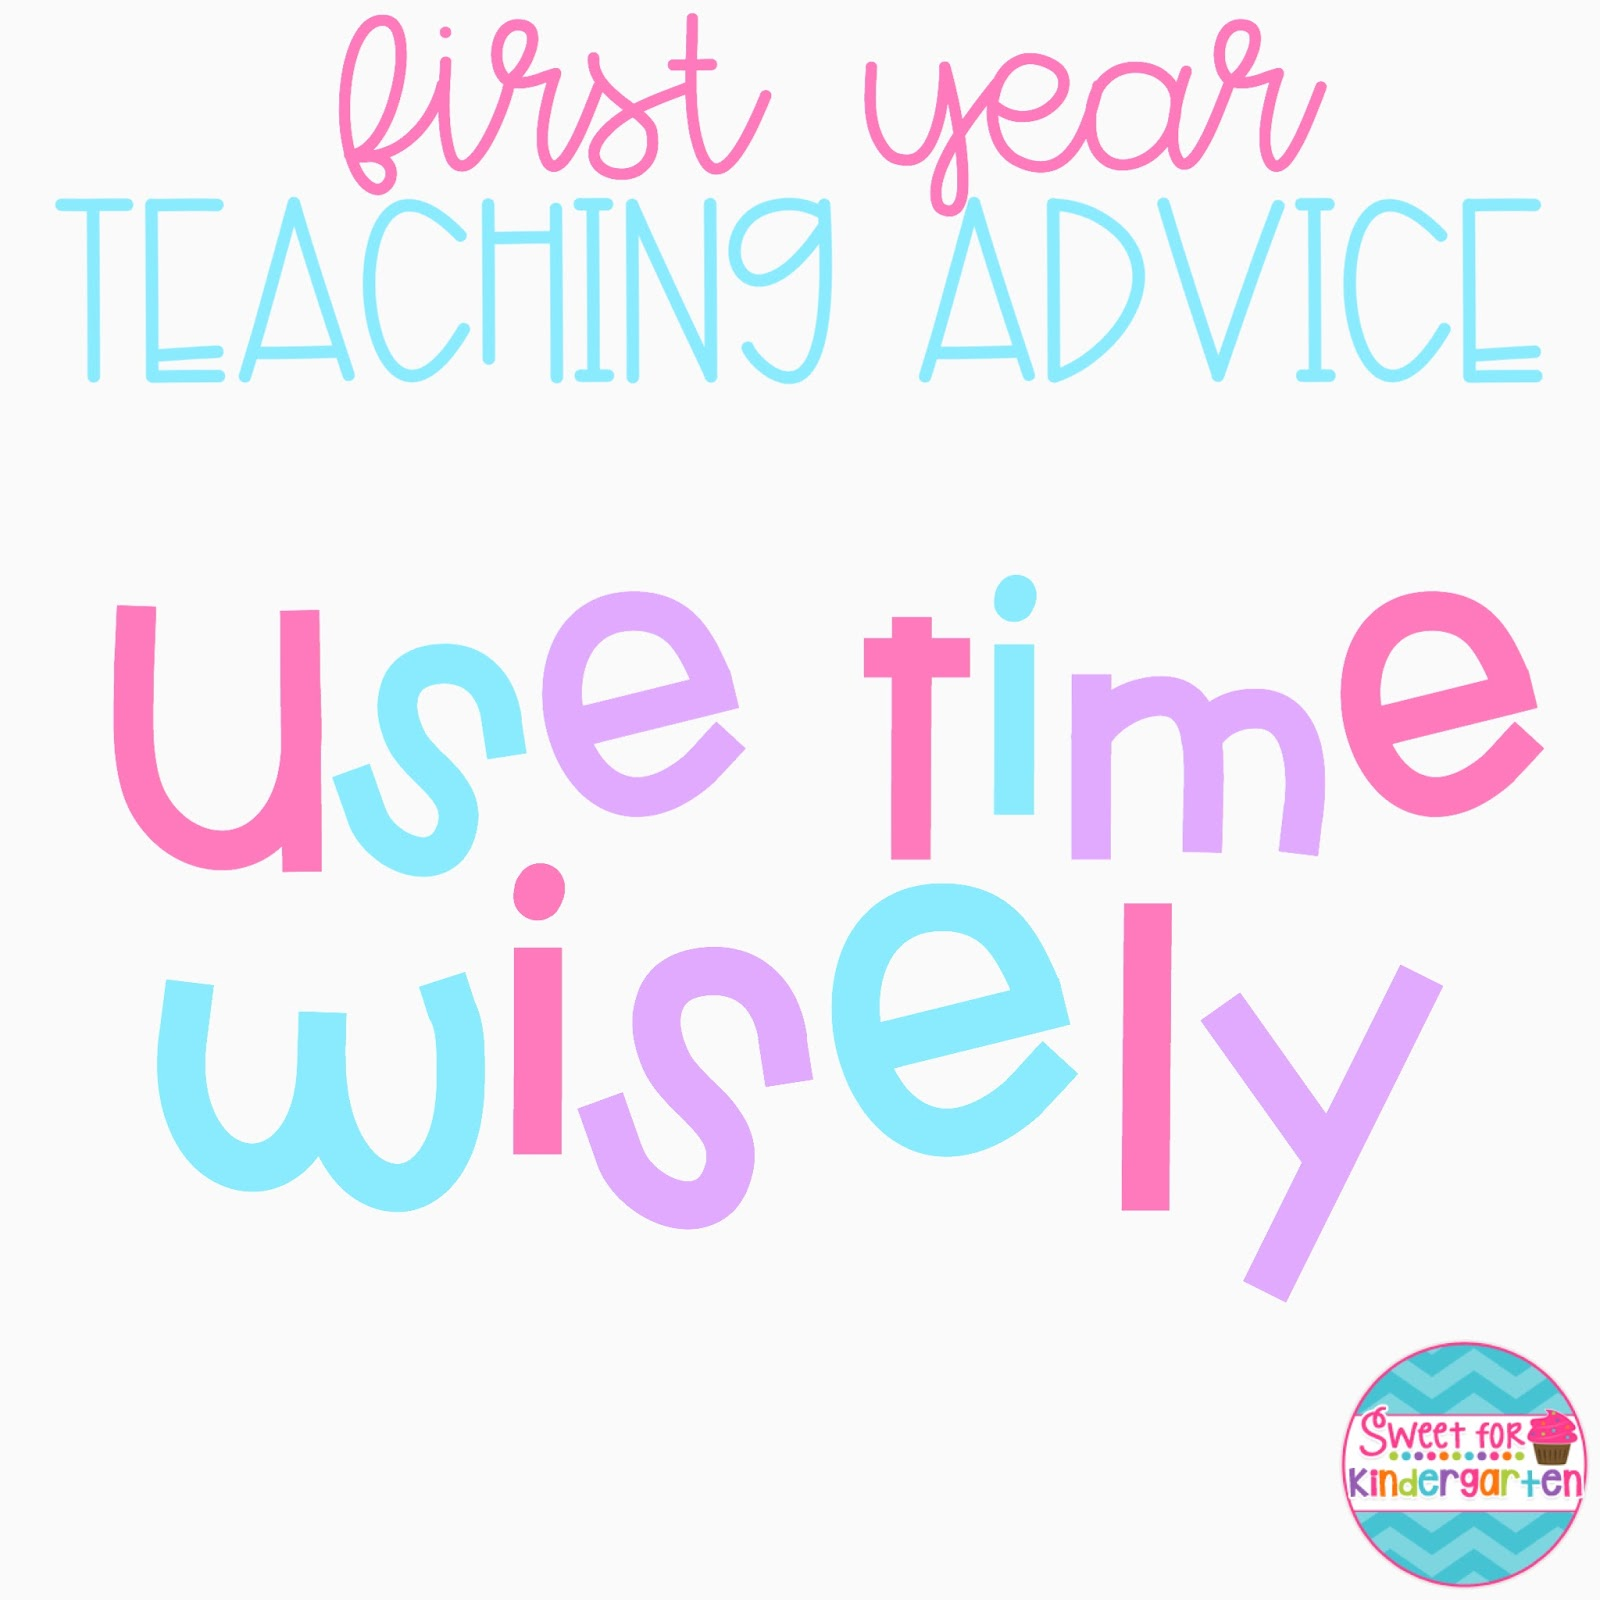 Sweet For Kindergarten First Year Teaching Advice